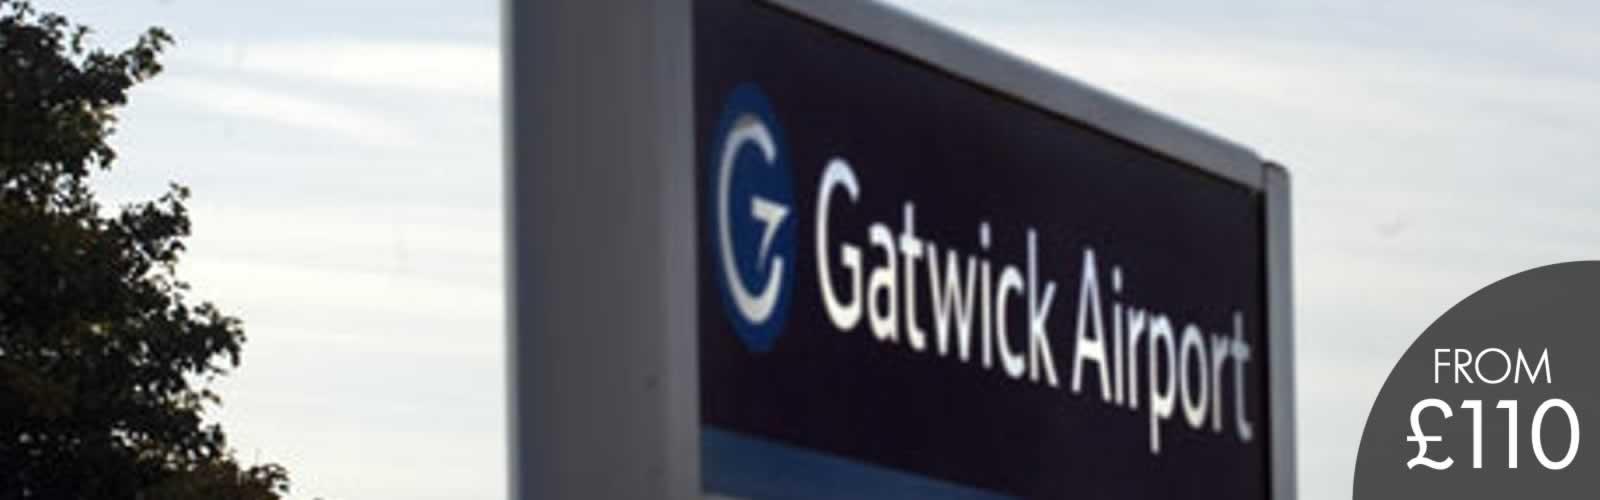 Gatwick Airport Transfers Leighton Buzzard